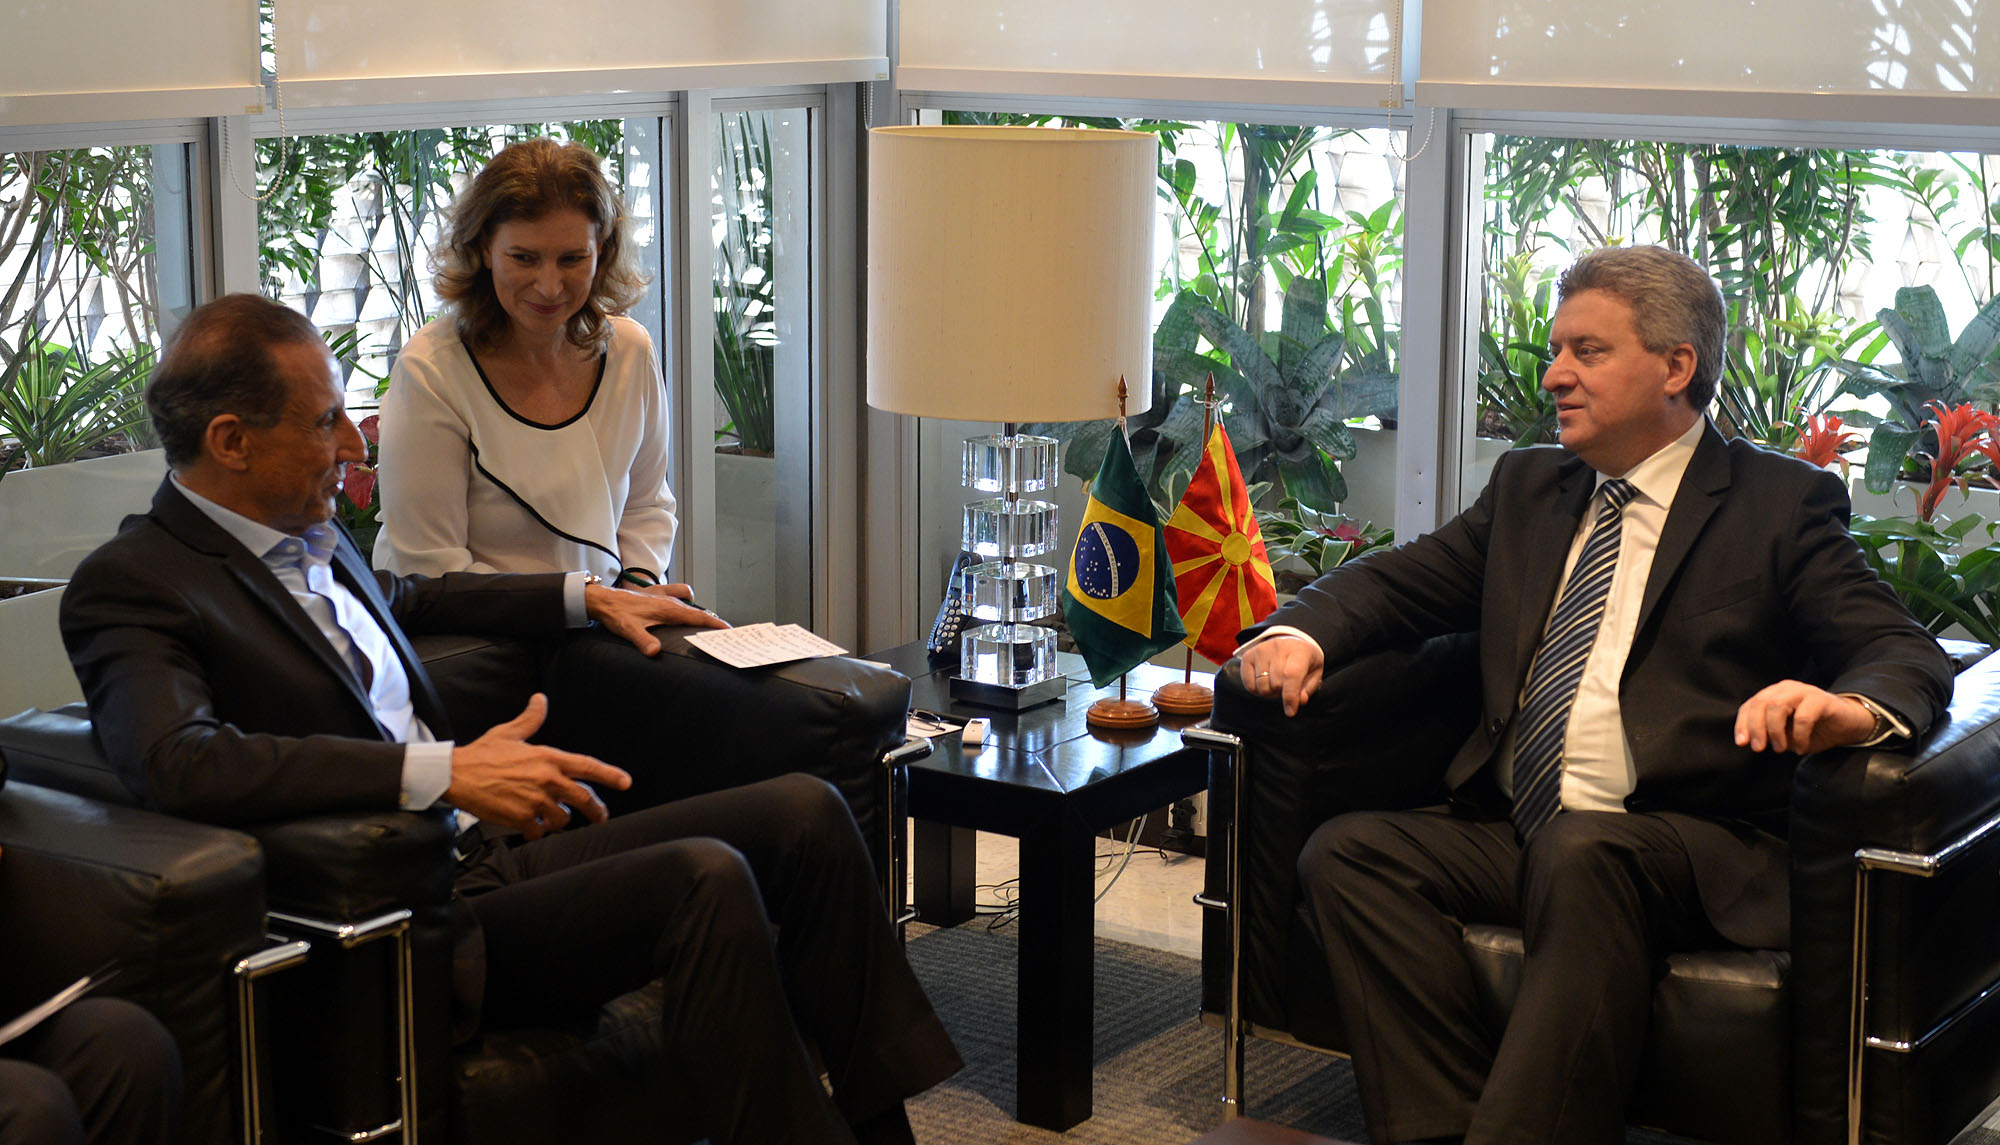 Иванов ја започна посетата на Бразил  утре свечено отворање на македонската амбасада